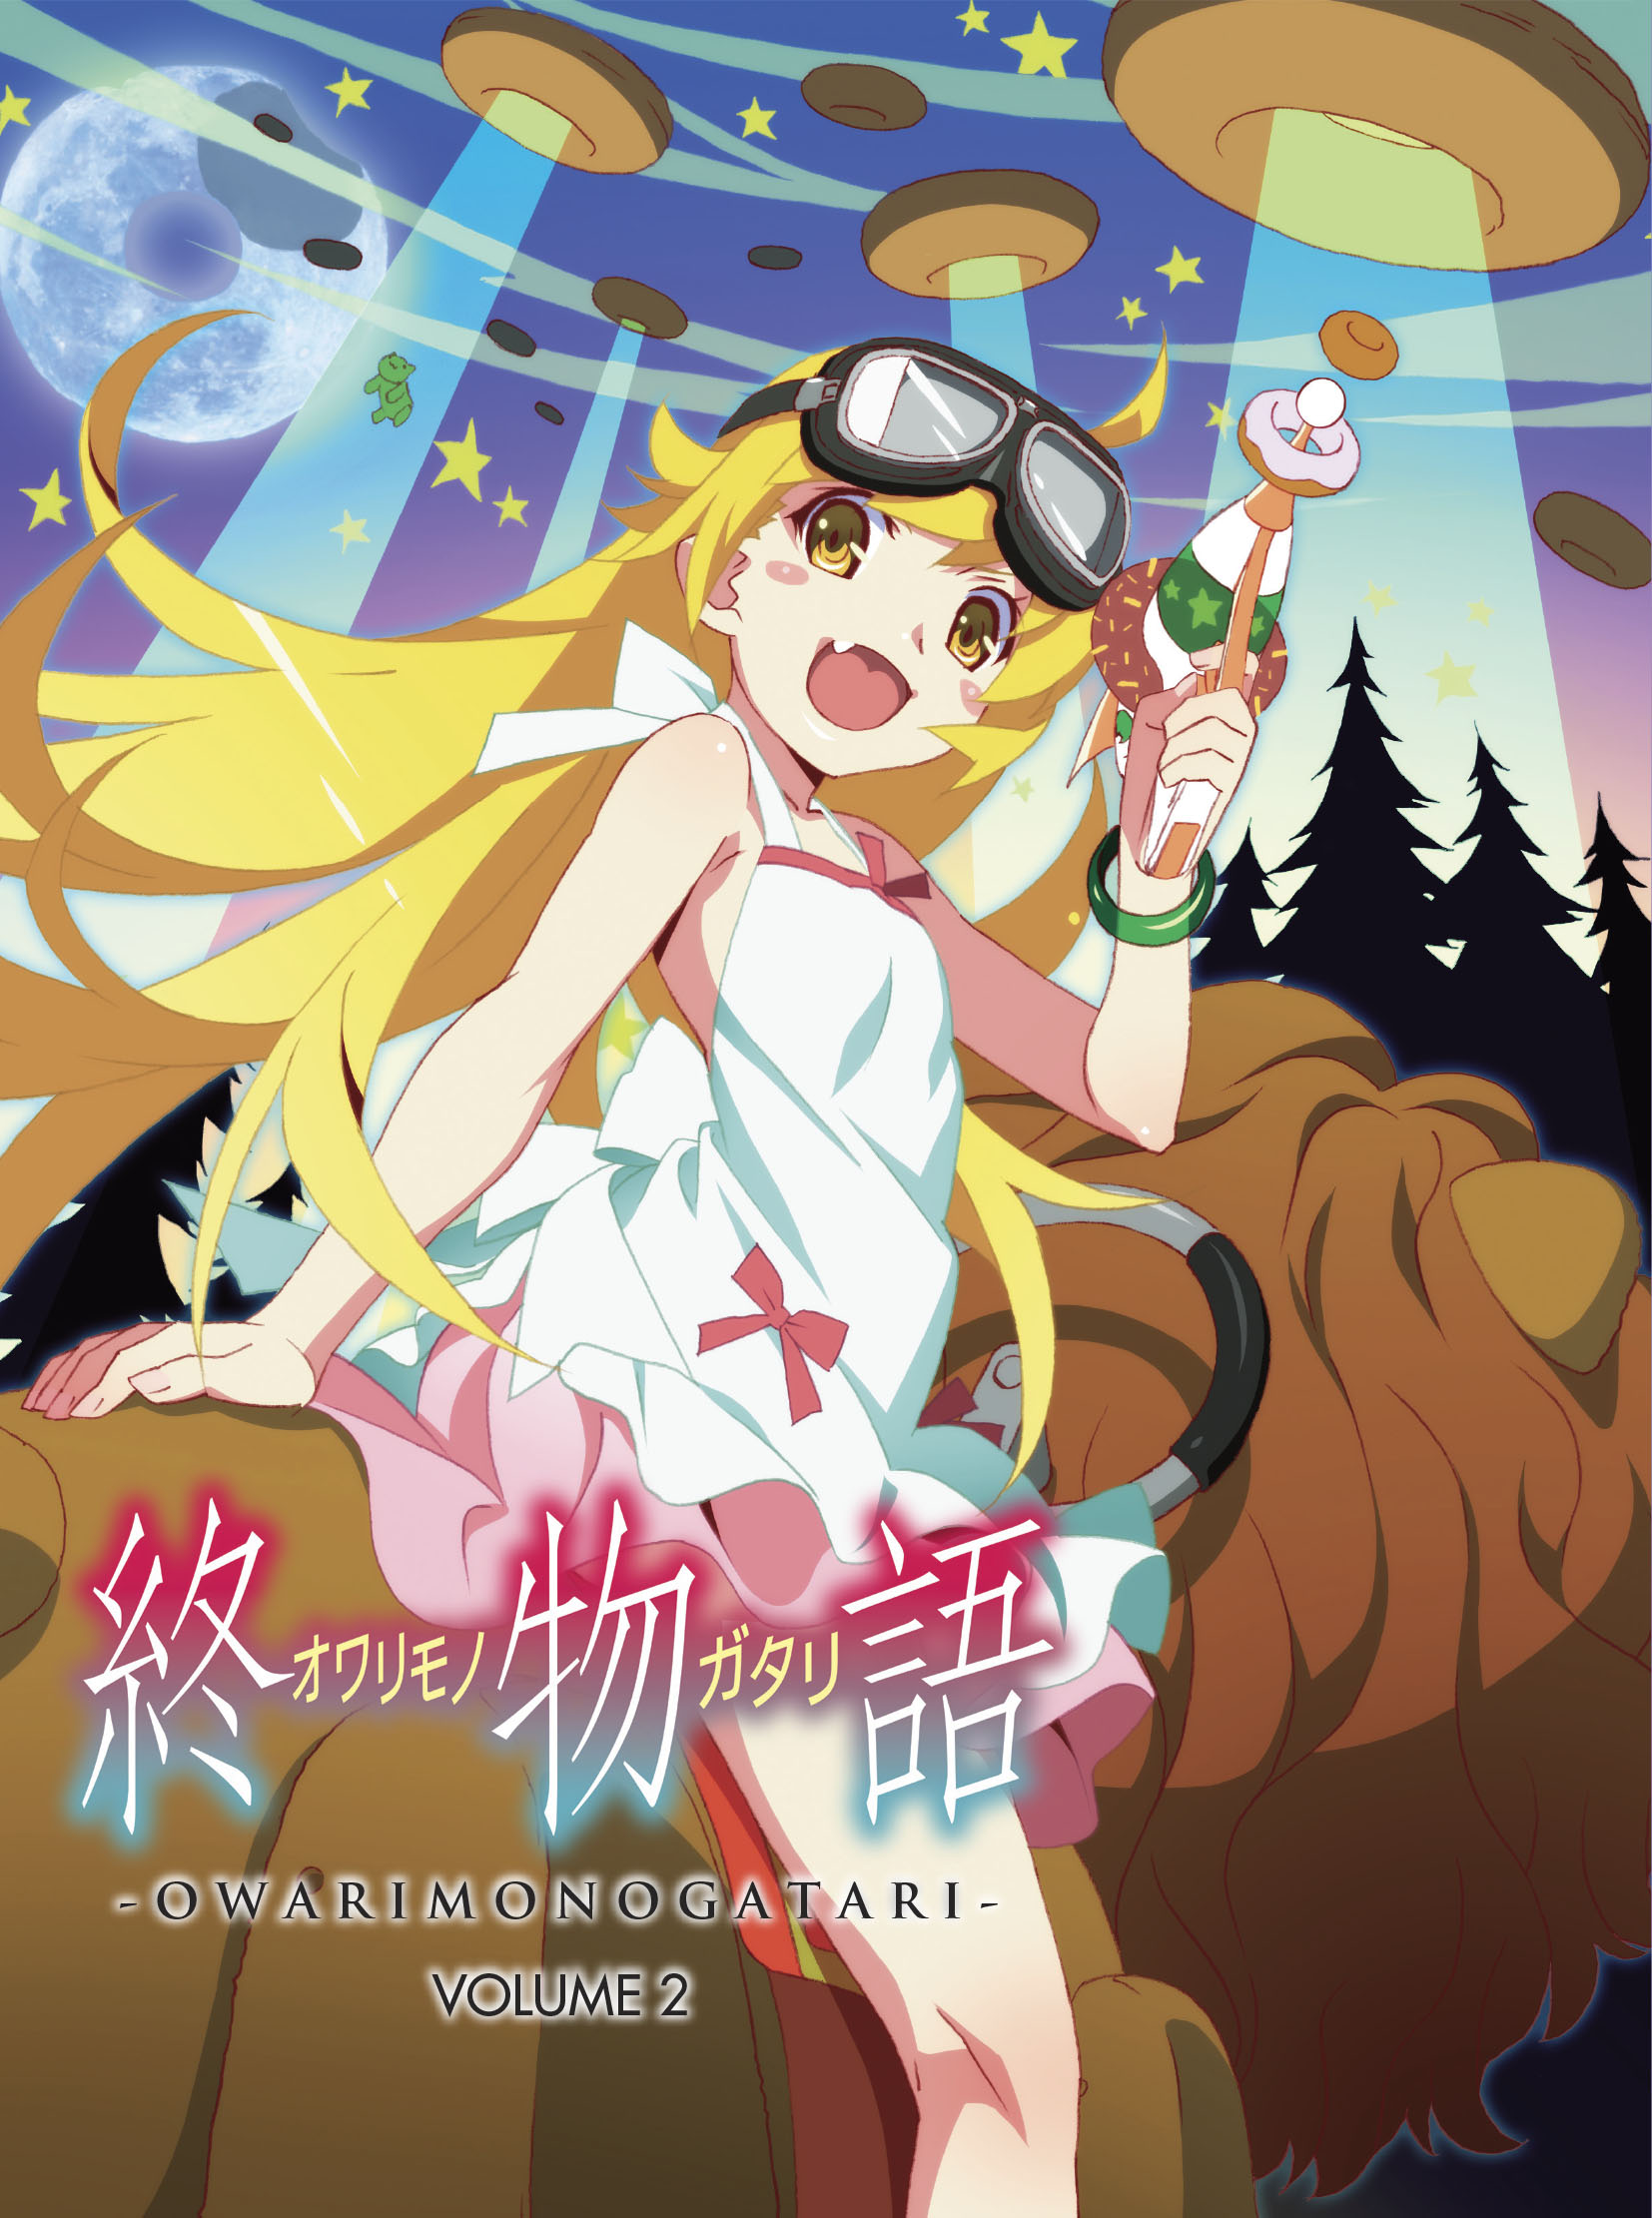 Owarimonogatari Volume 2 Blu-ray 816546020378